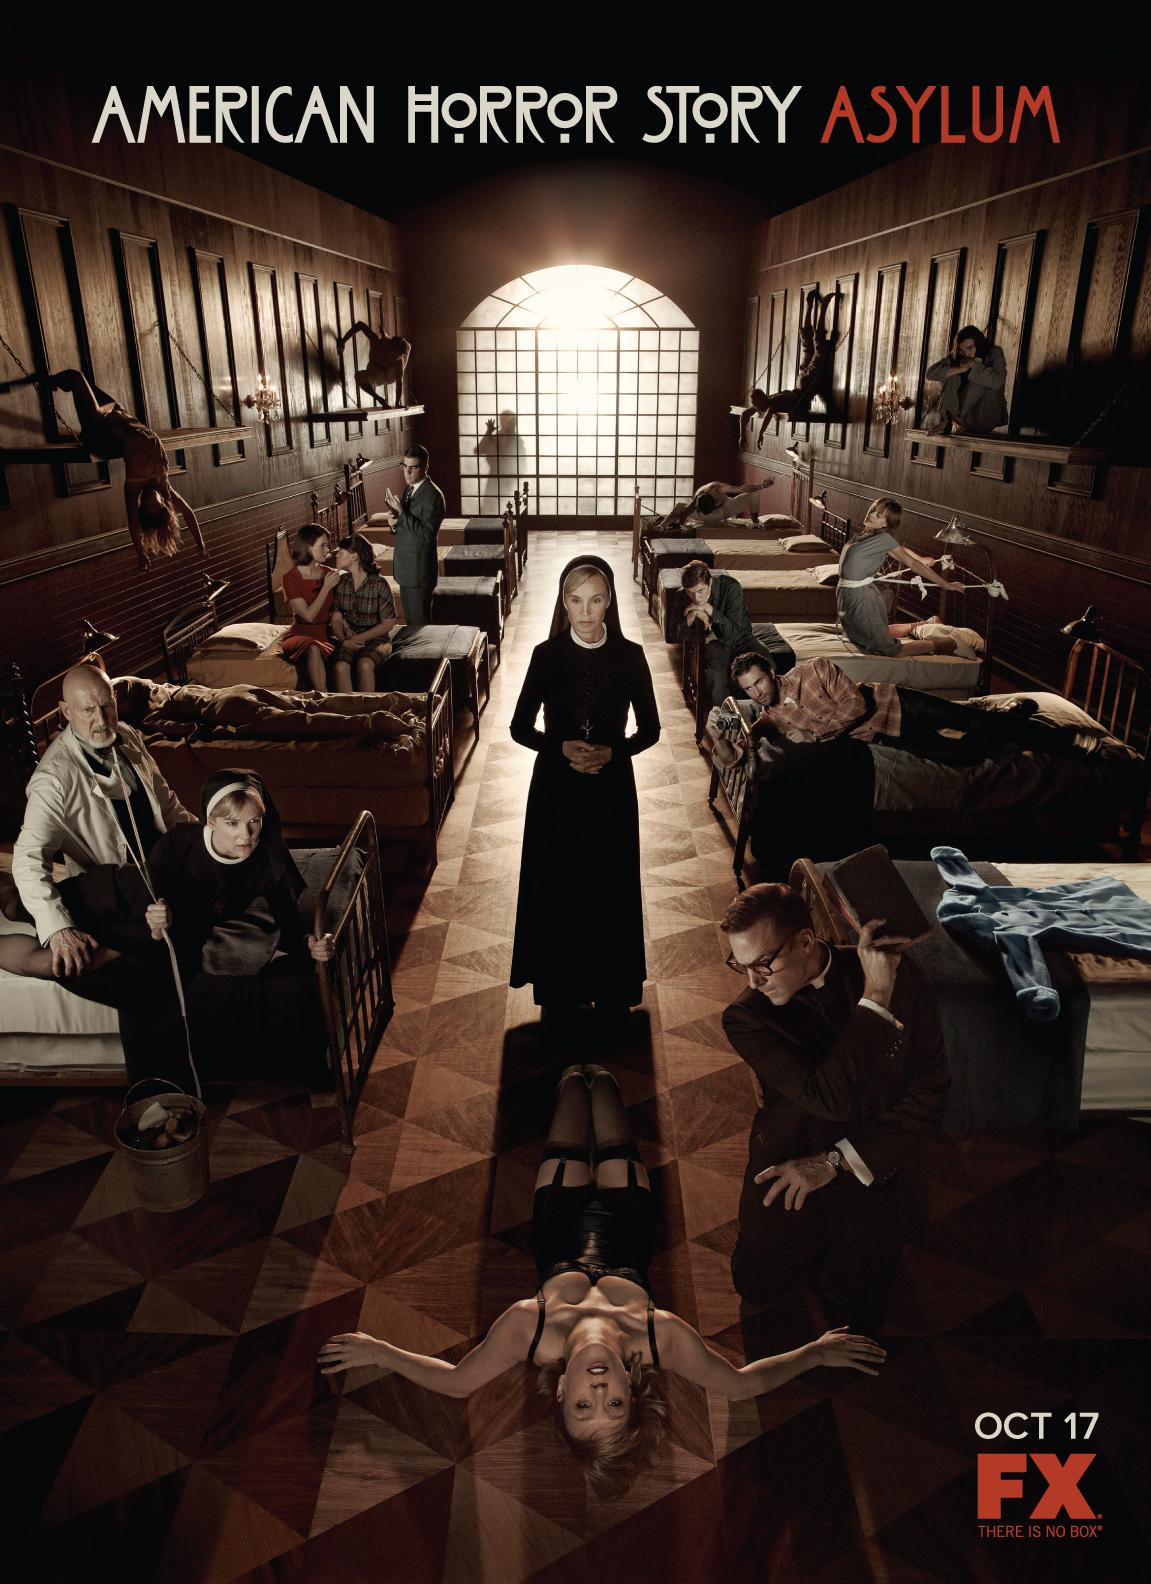 American-horror-story-asylum-key-art.jpg